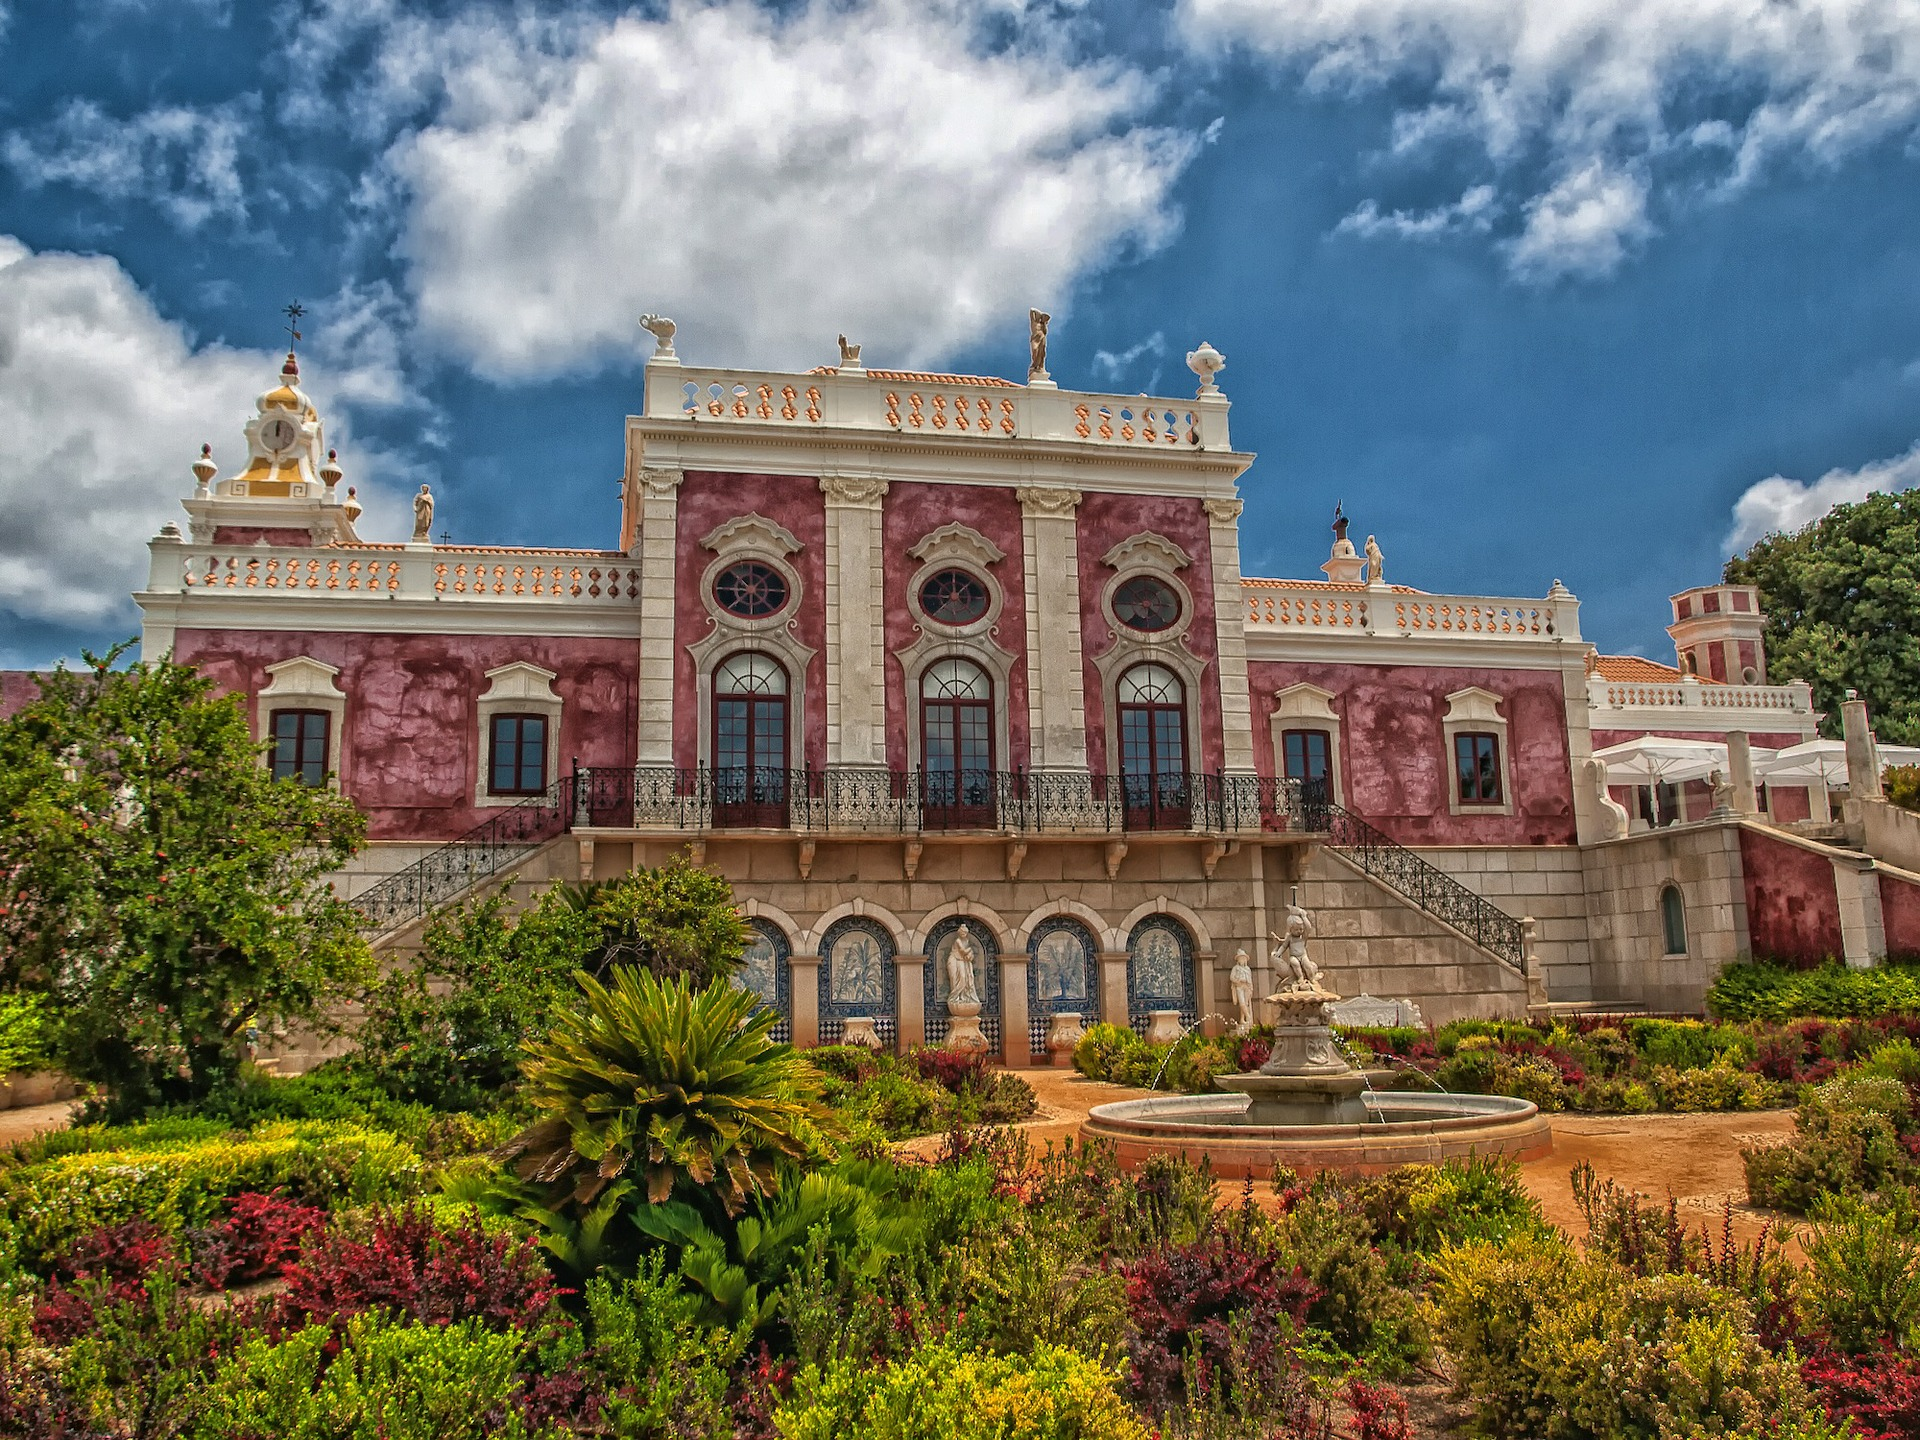 palace-of-estoi-373974_1920.jpg